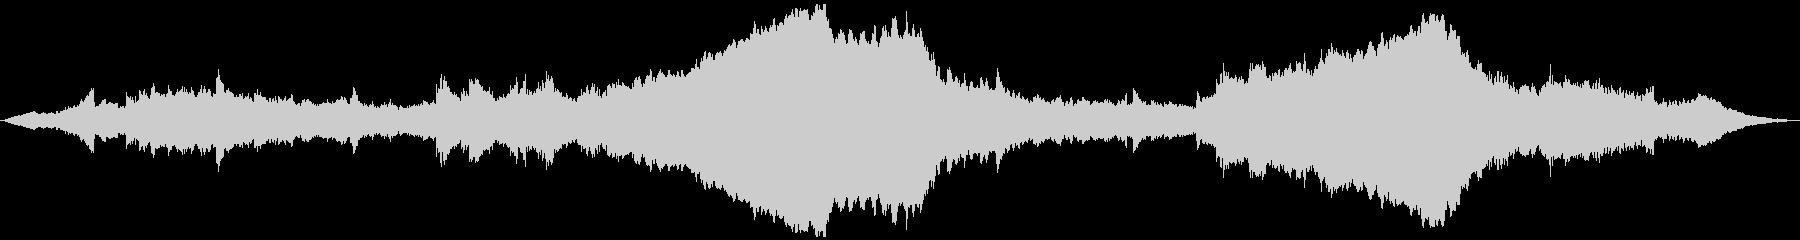 PADS 逆チャイム01の未再生の波形